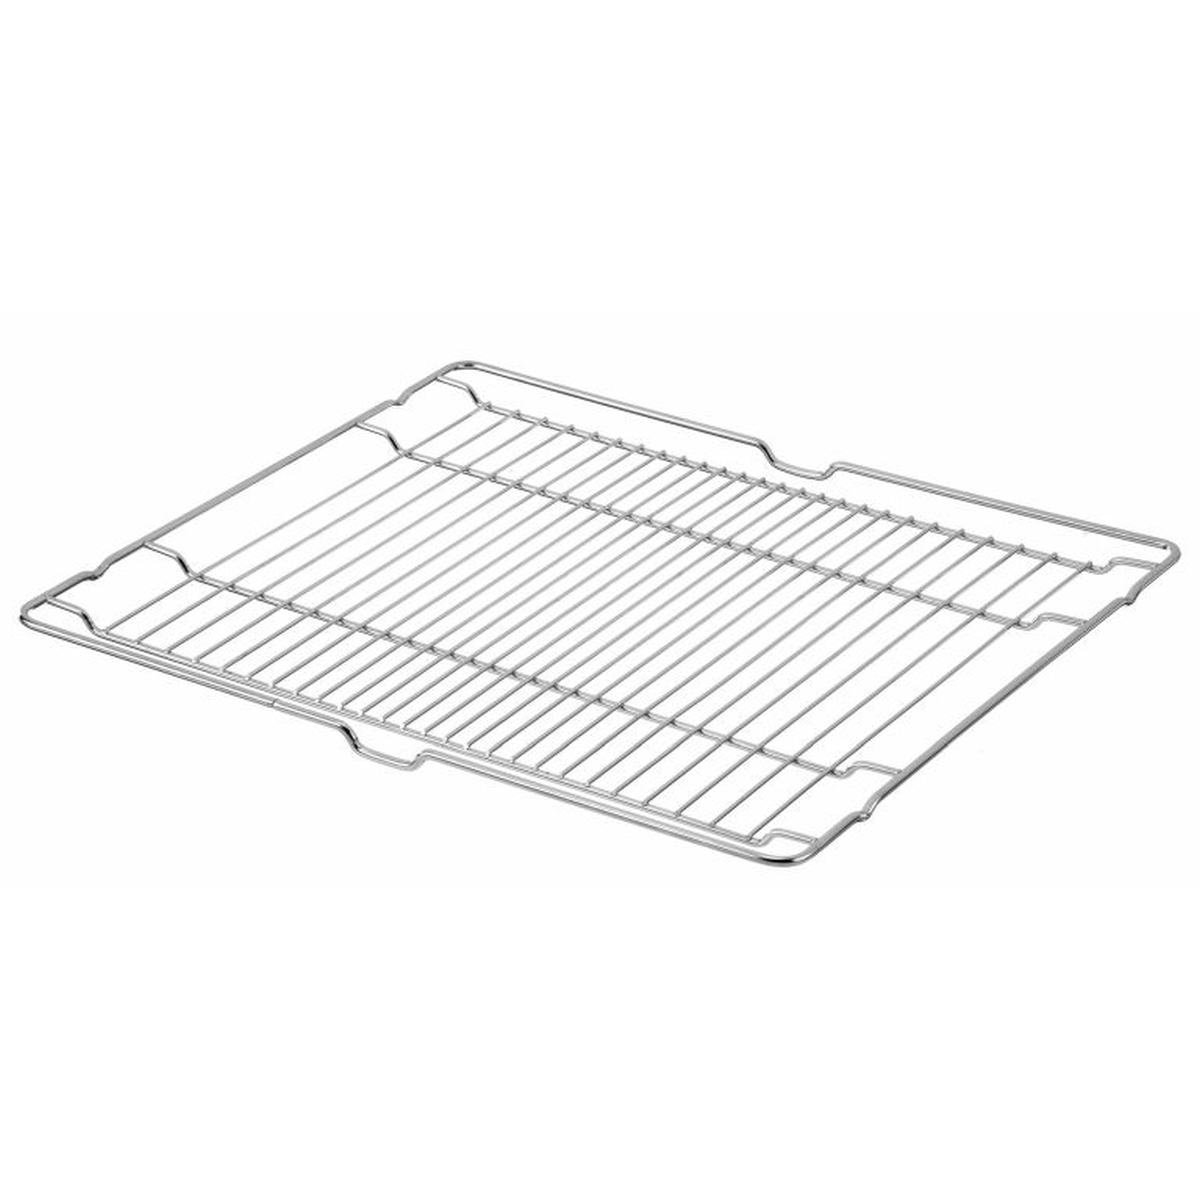 Ovn rist 430 x 375 mm. Constructa